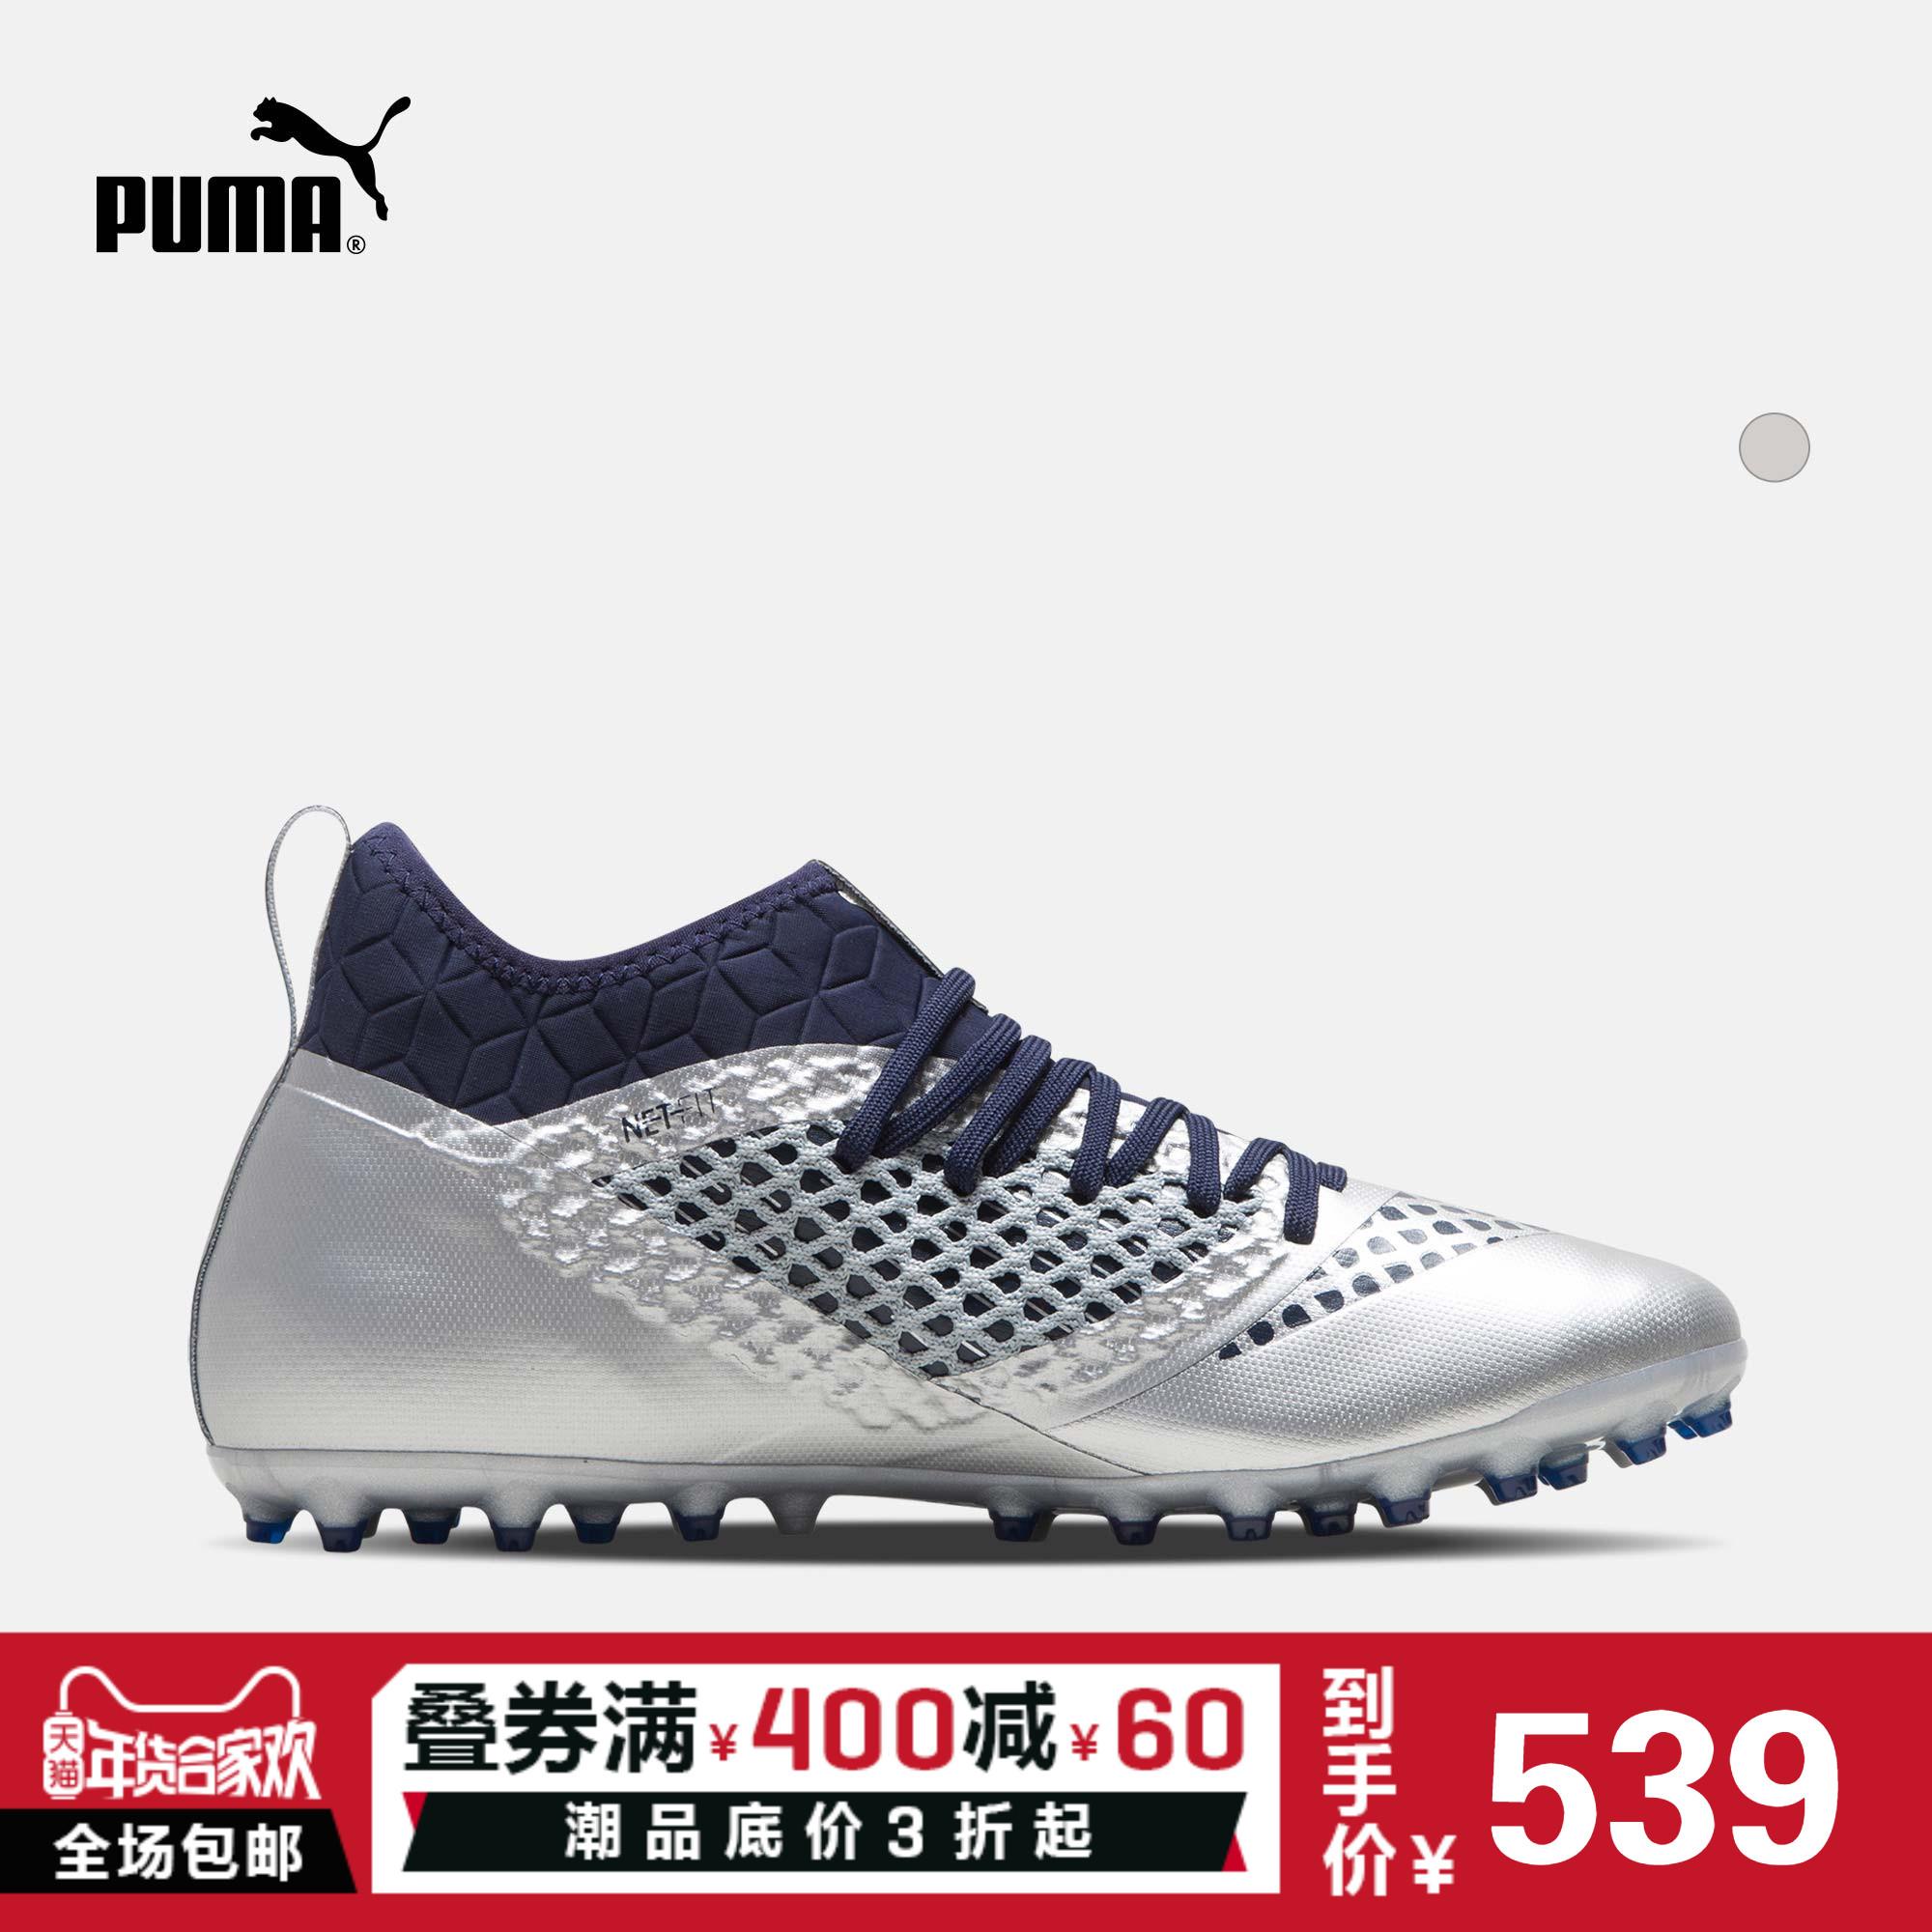 PUMA彪马官方 男子足球鞋 FUTURE 2.3 NETFIT MG 104833